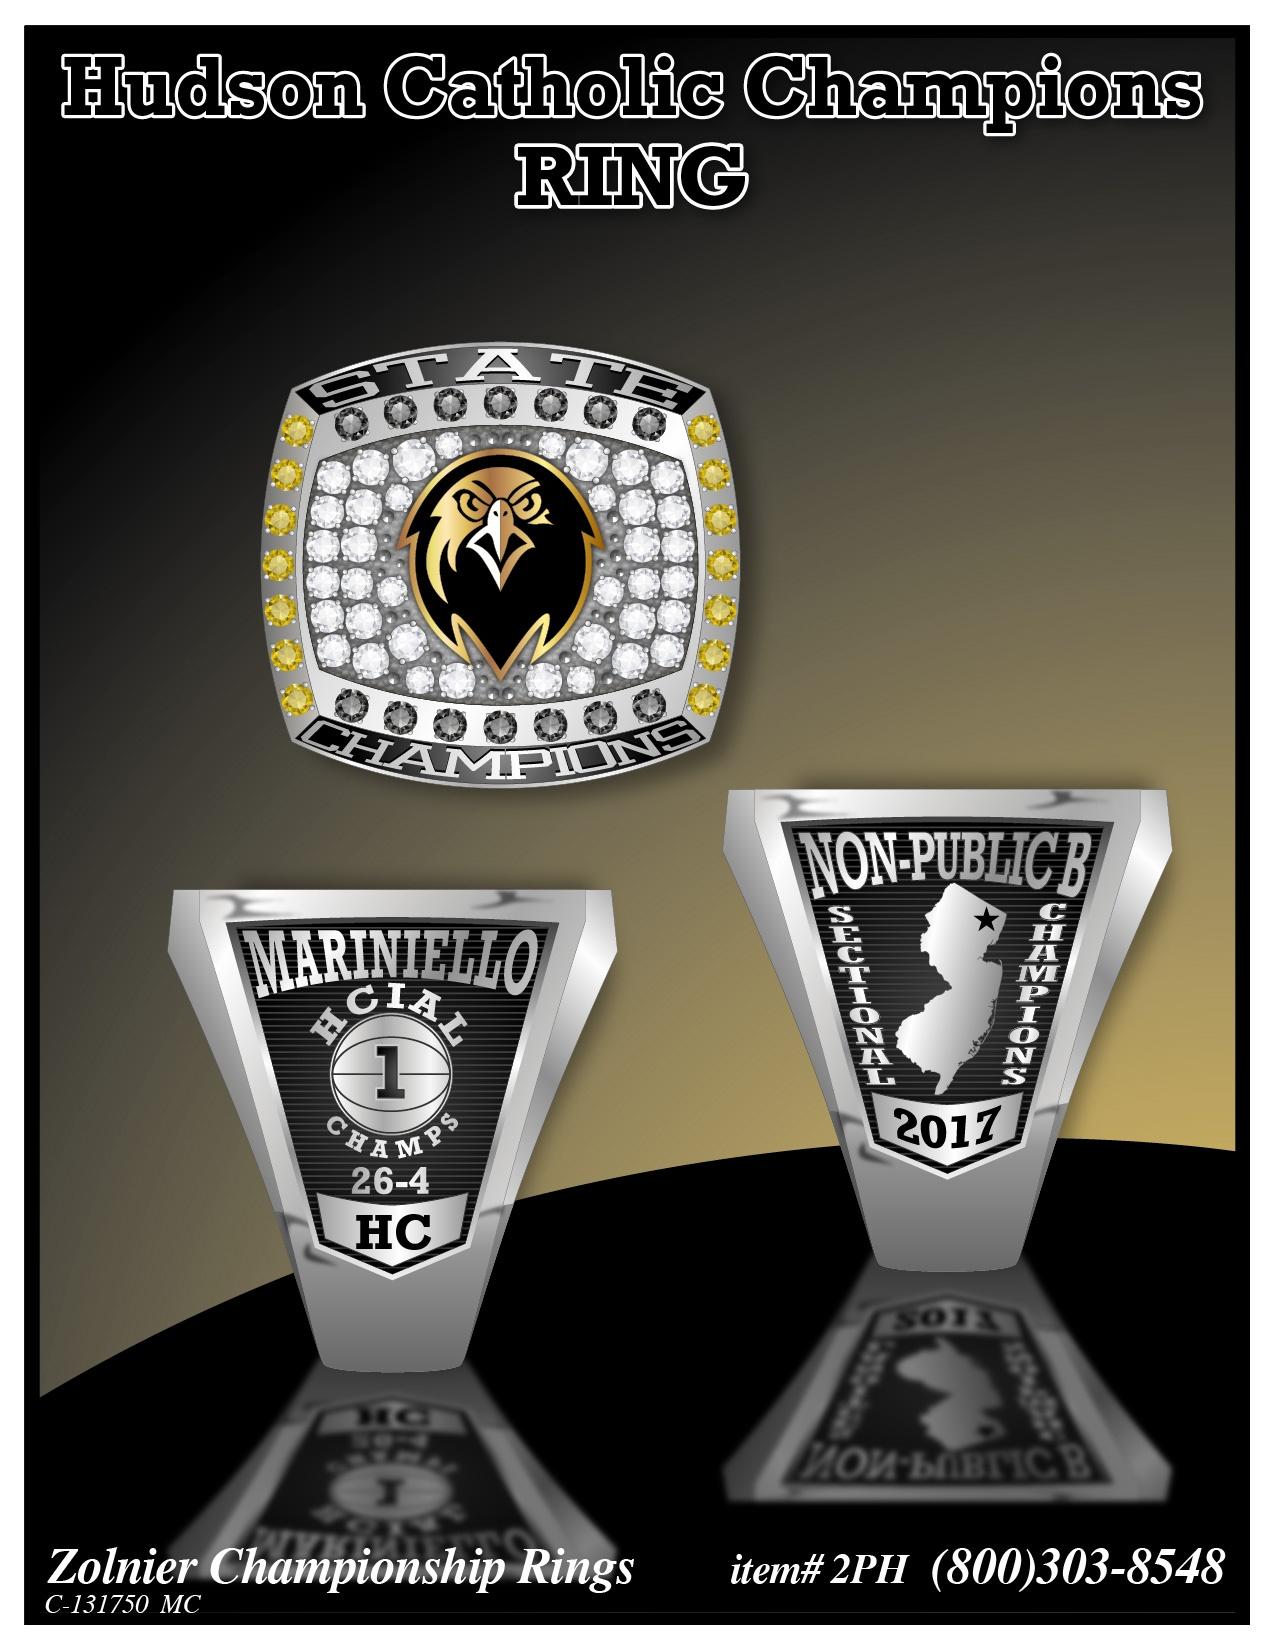 C-131750 Hudson Catholic Basketball Championship Ring 2